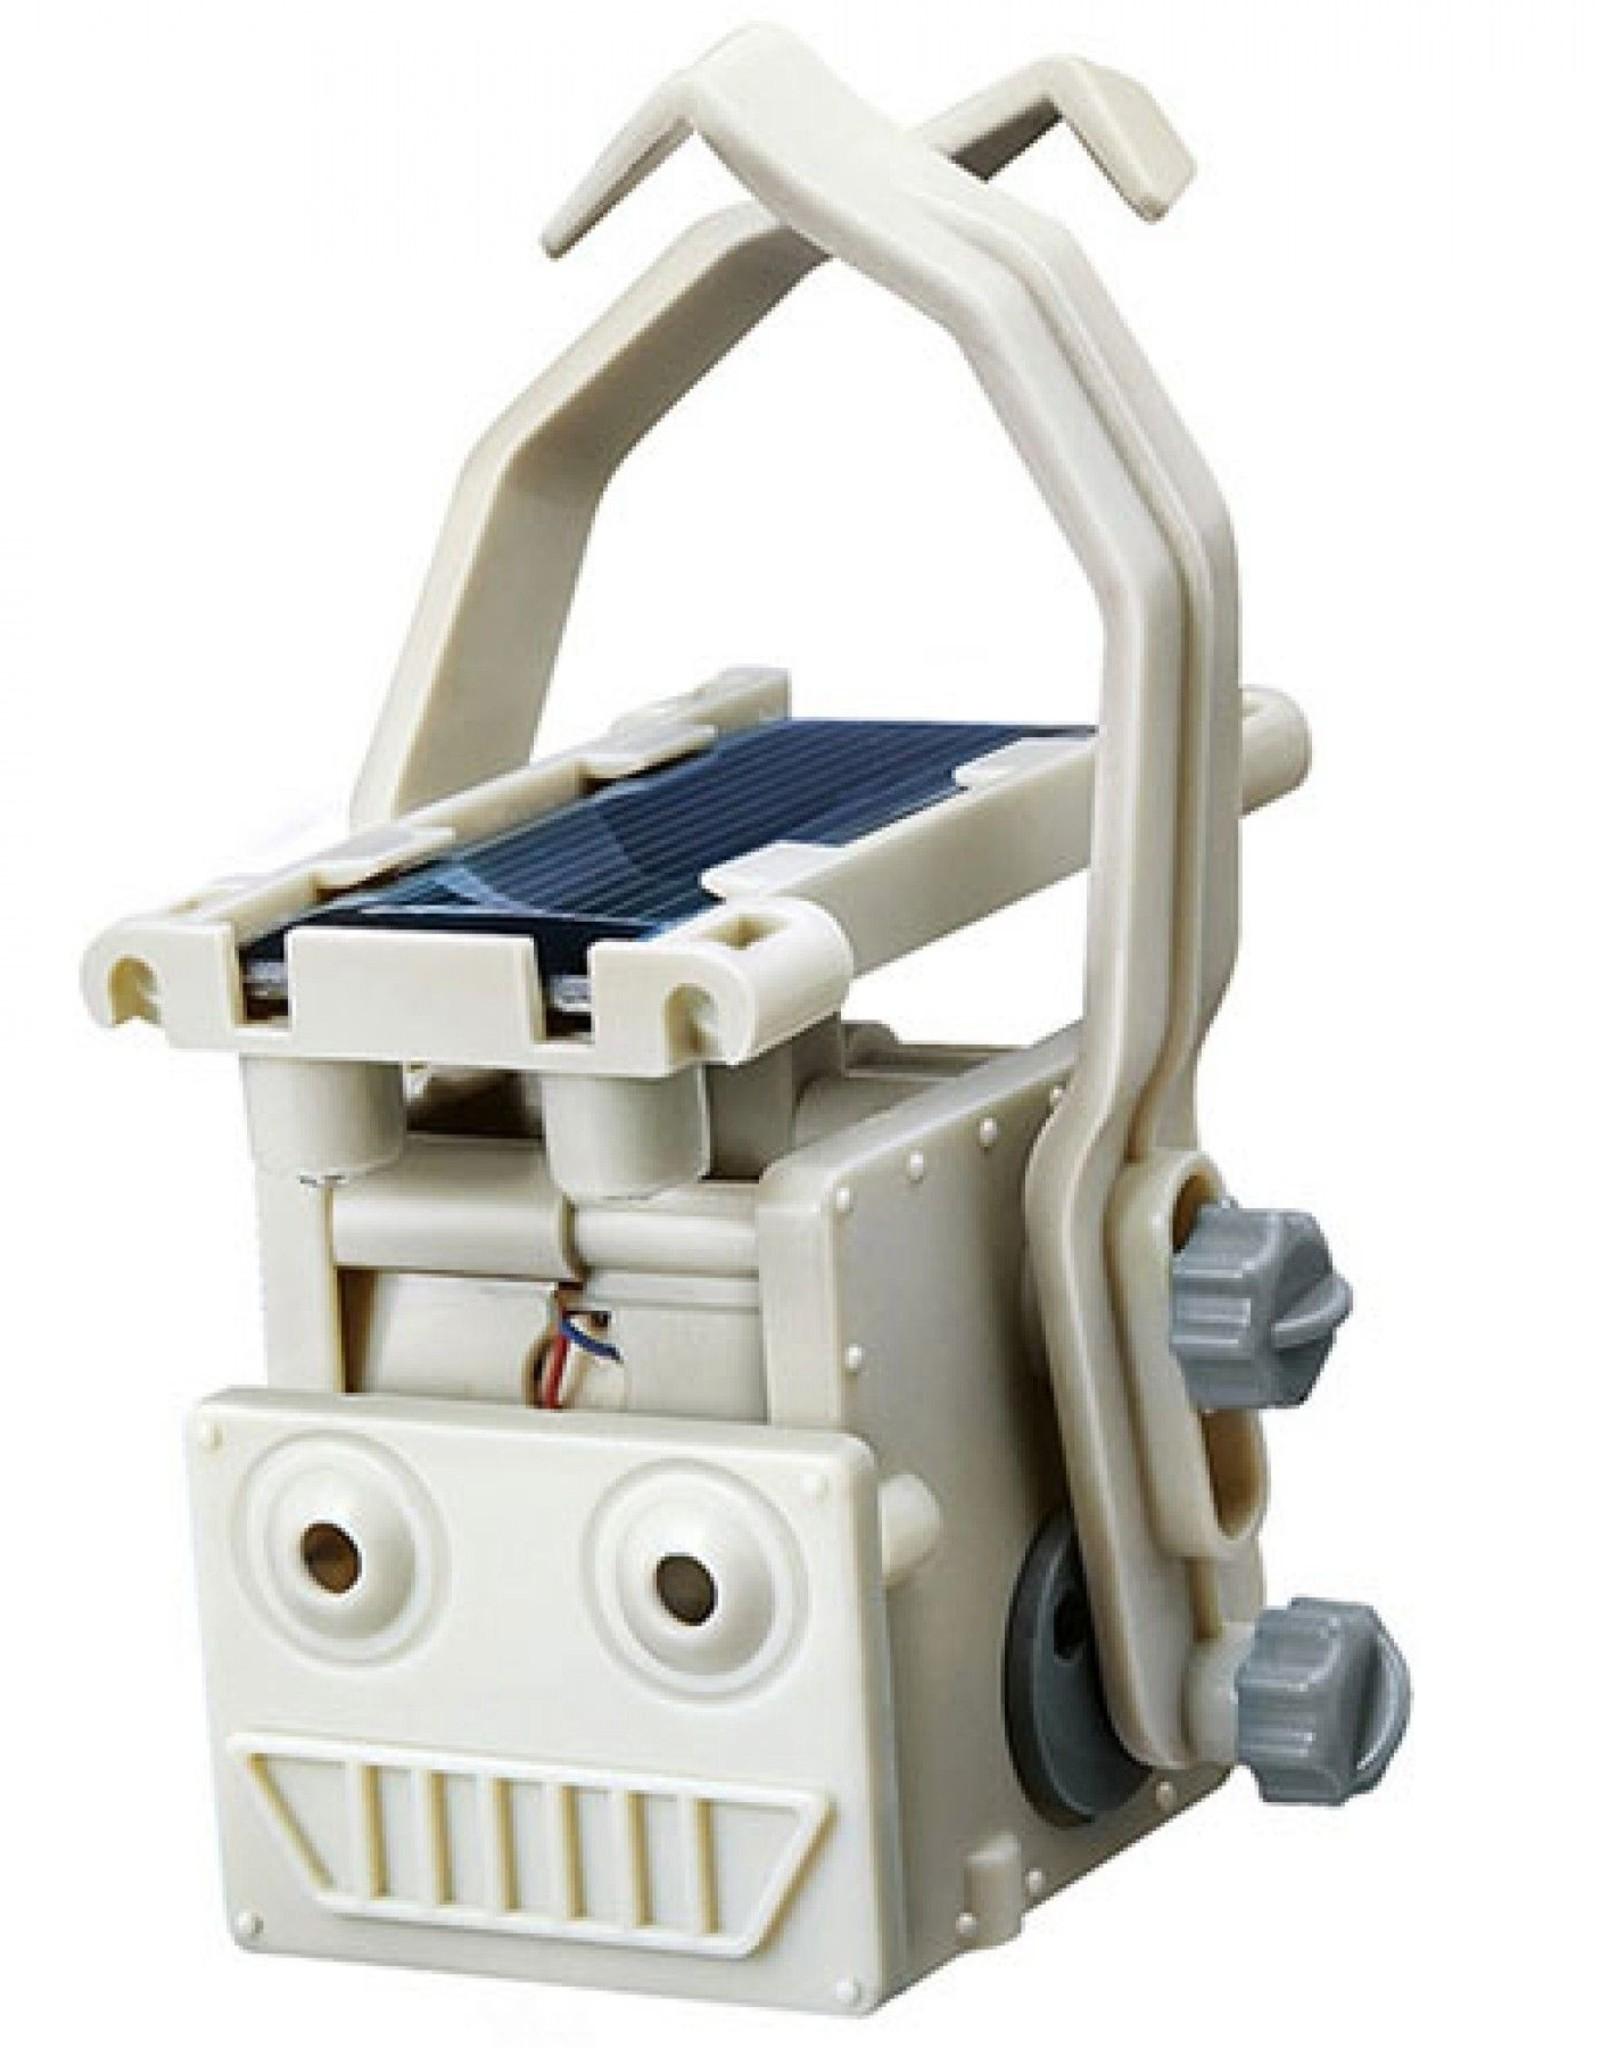 4M KIDZLABS GREEN SCIENCE - ECO 3-in-1 SOLAR ROBOT MINI